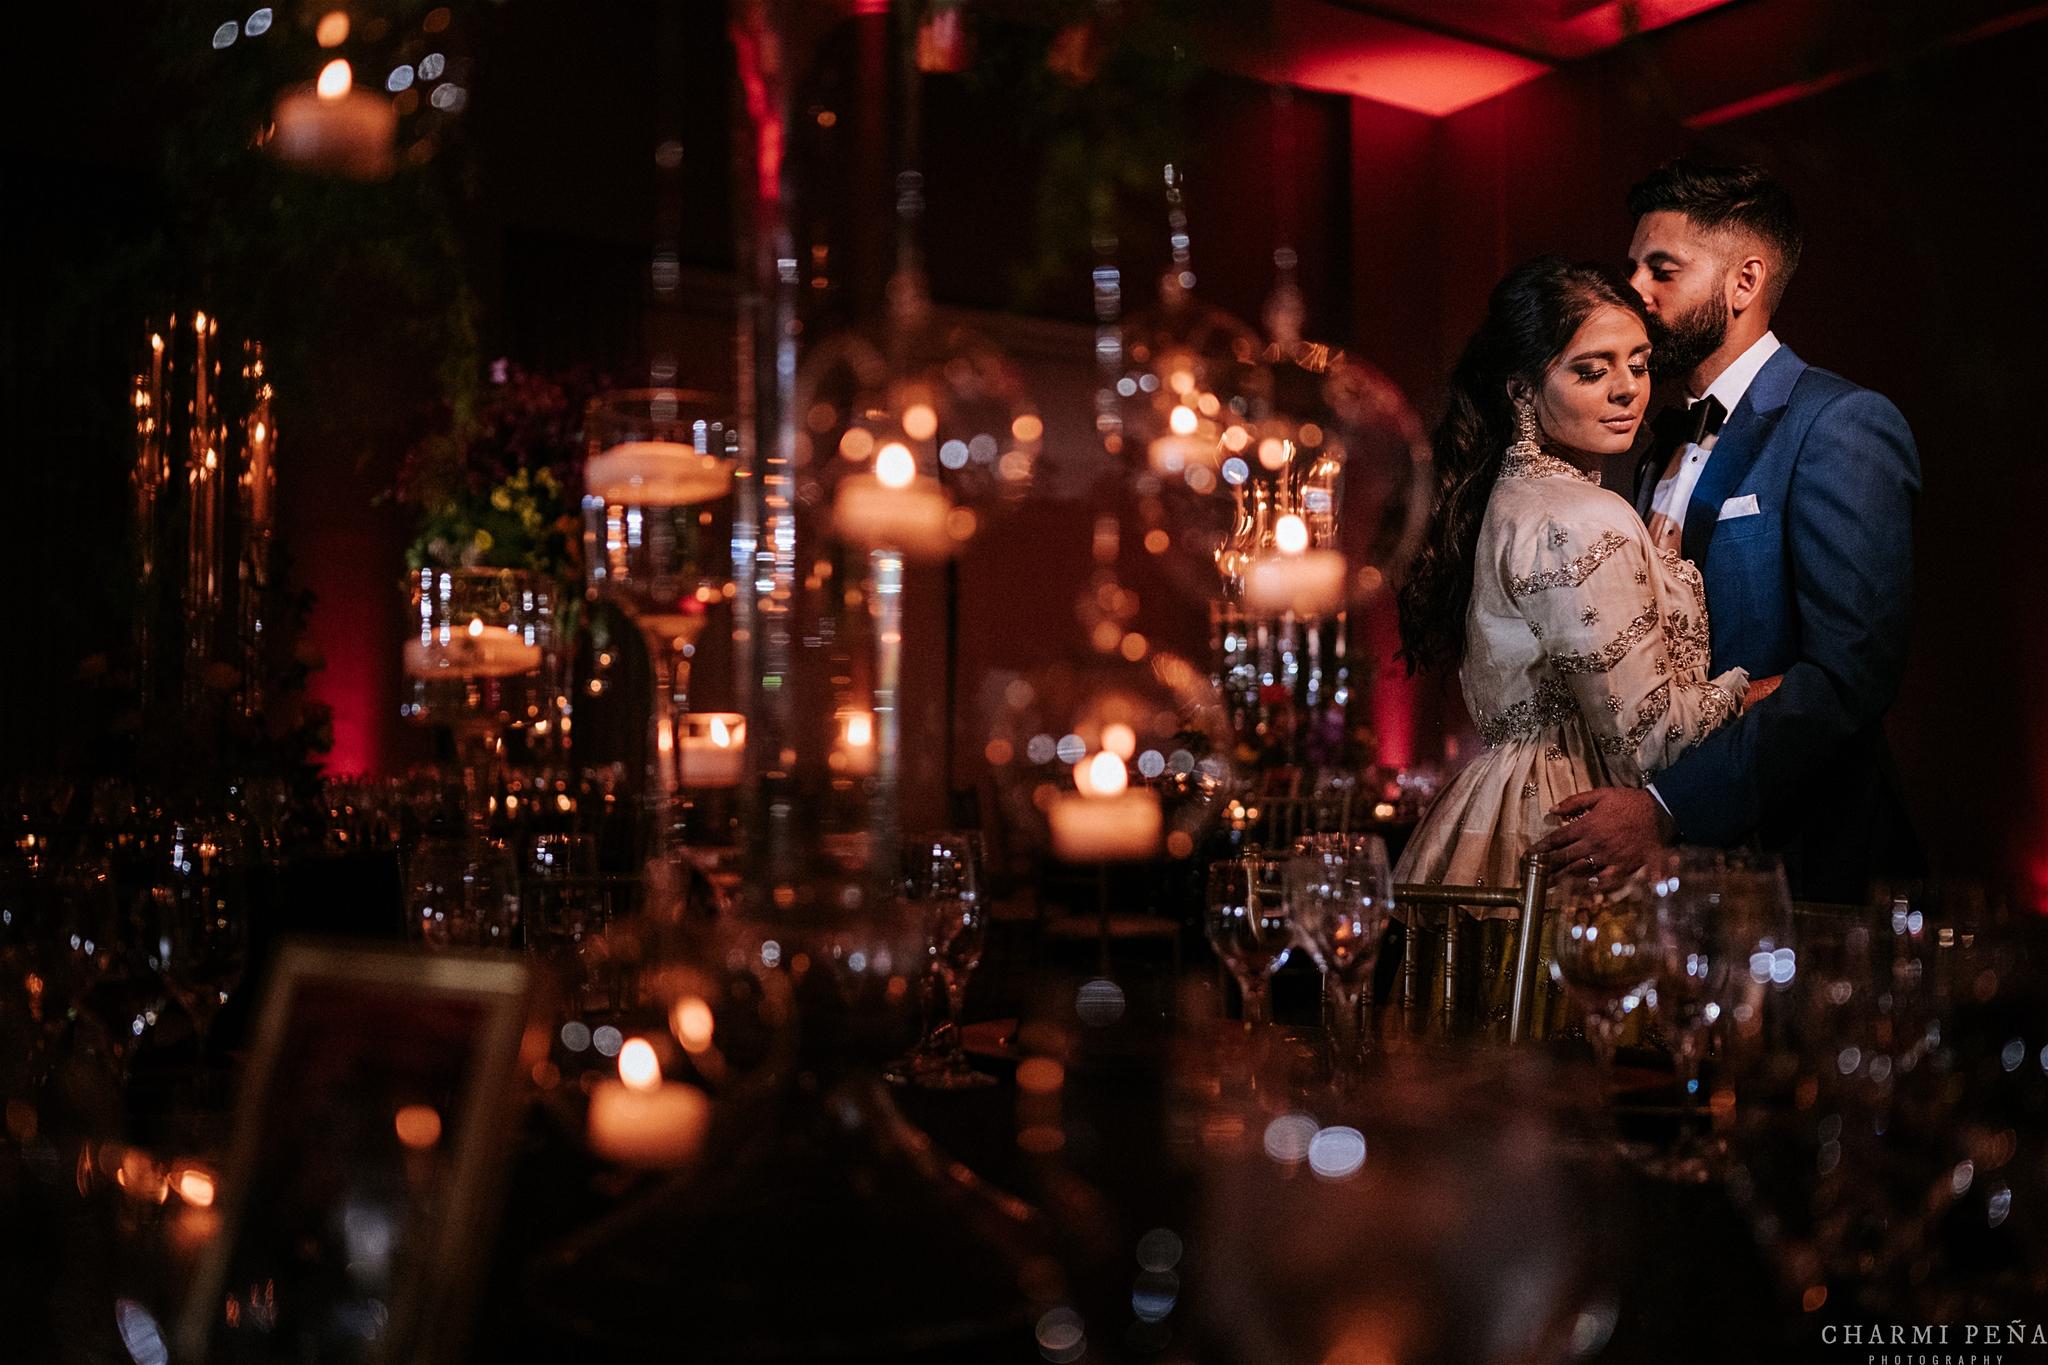 INDIAN WEDDING RECEPTION GROOM AND BRIDE.jpg